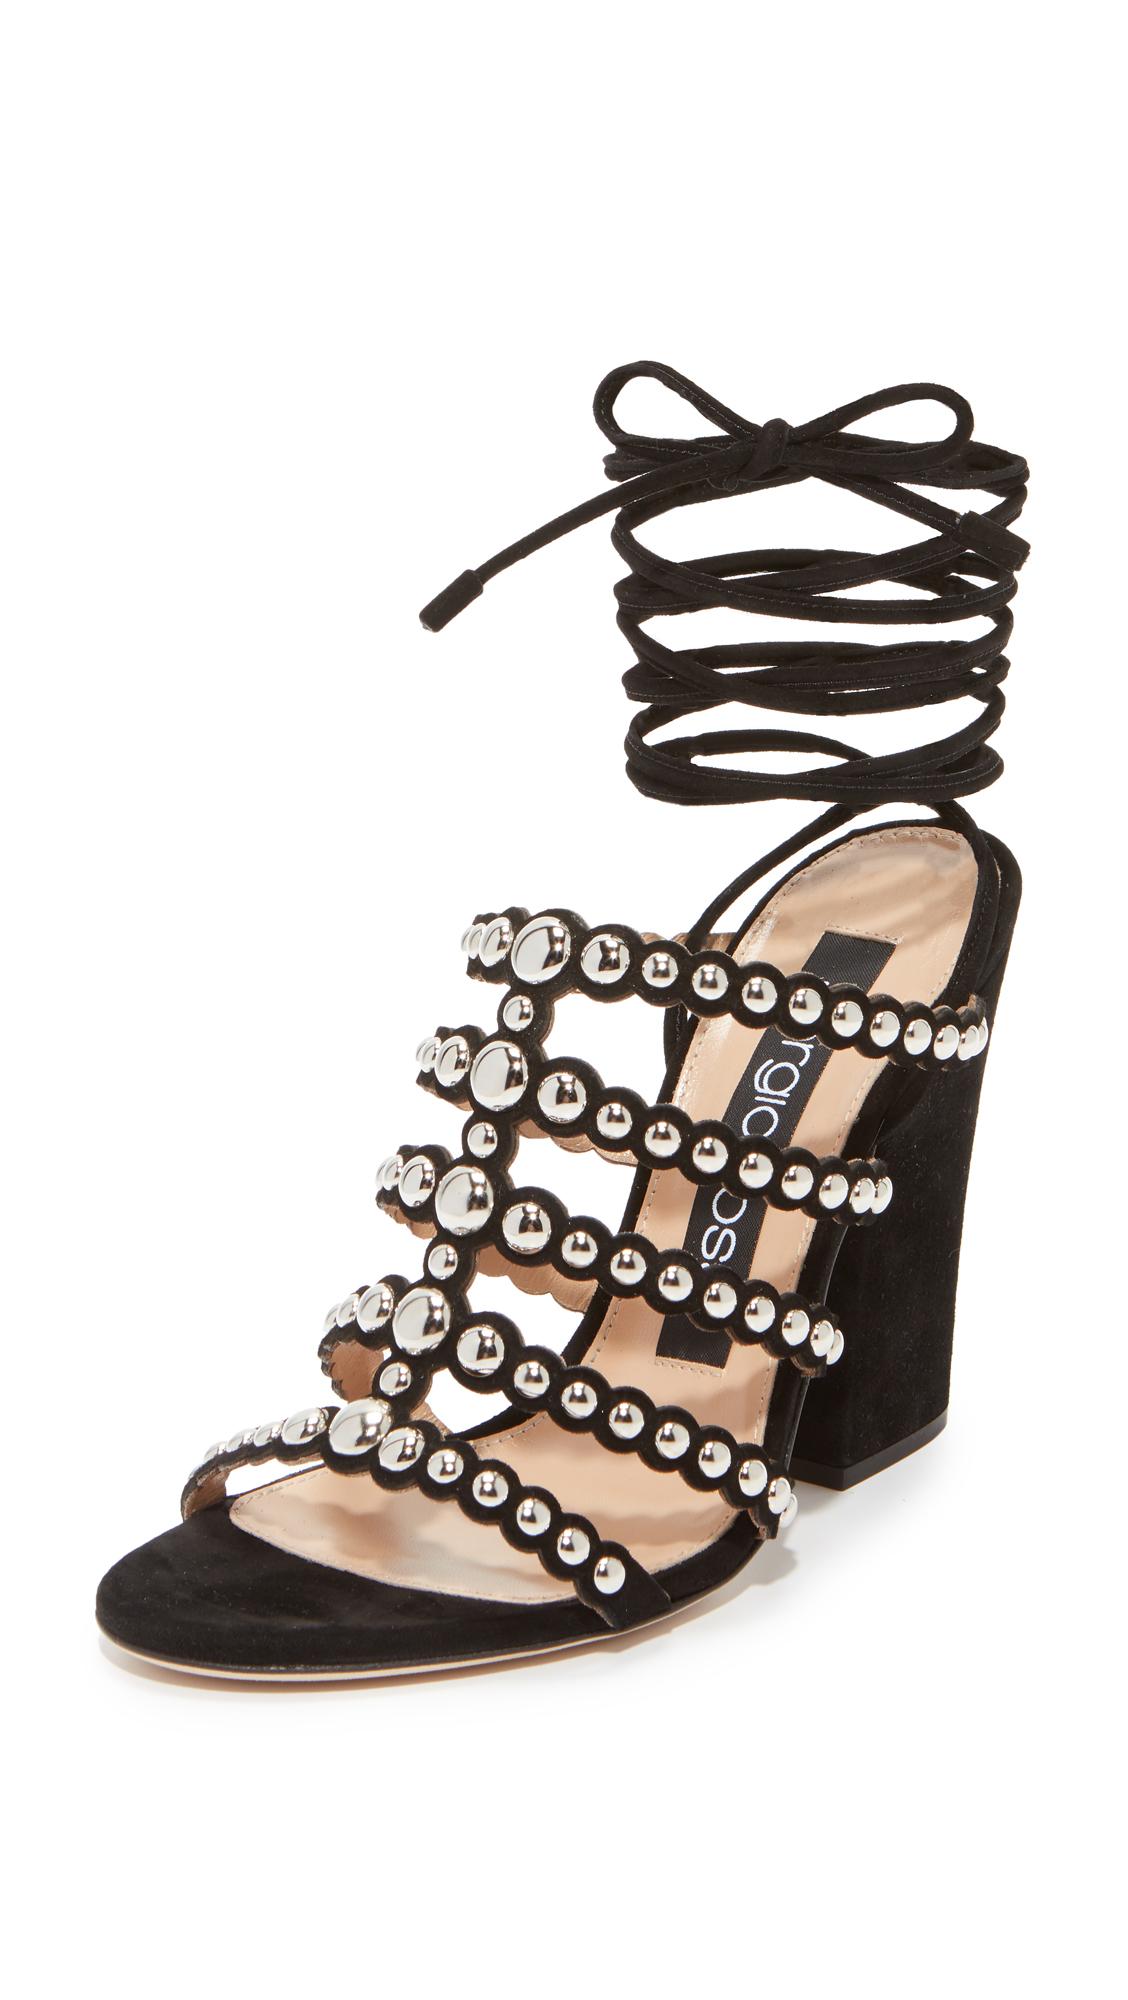 Sergio Rossi Electtra Sandal Heels - Nero